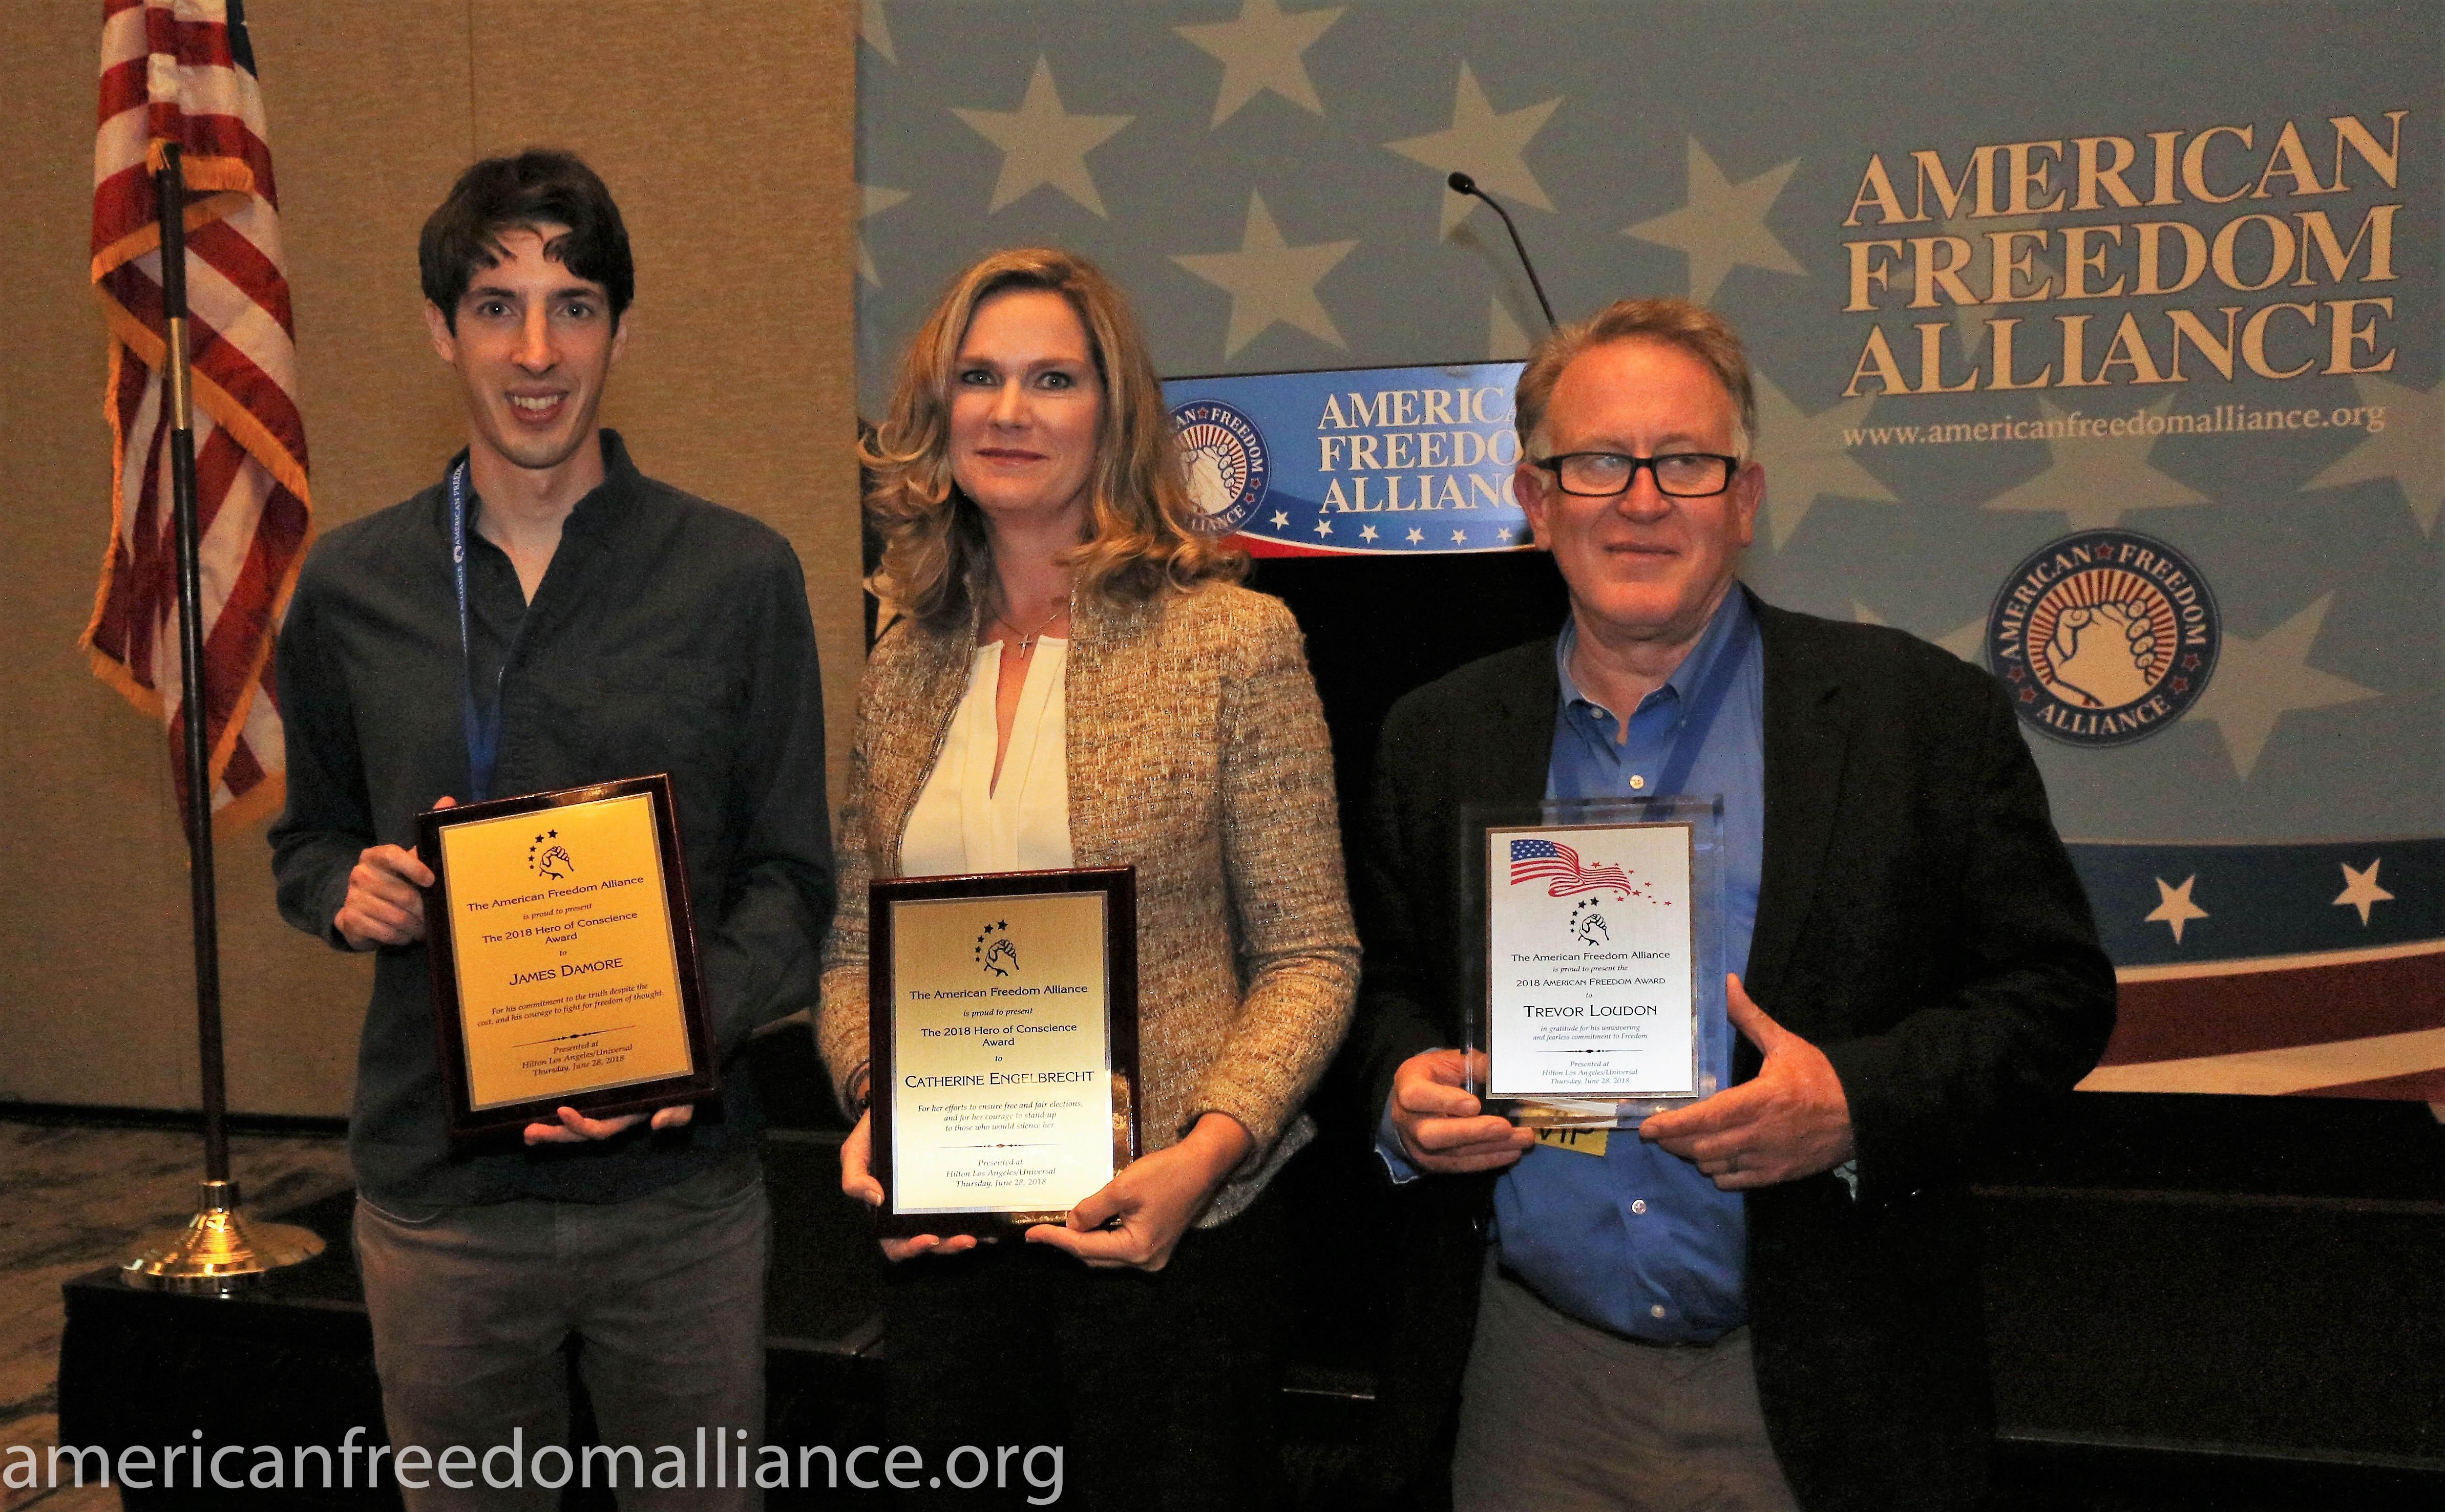 Awardees James Damore, Catherine engelbrecht, Trevor Loudon